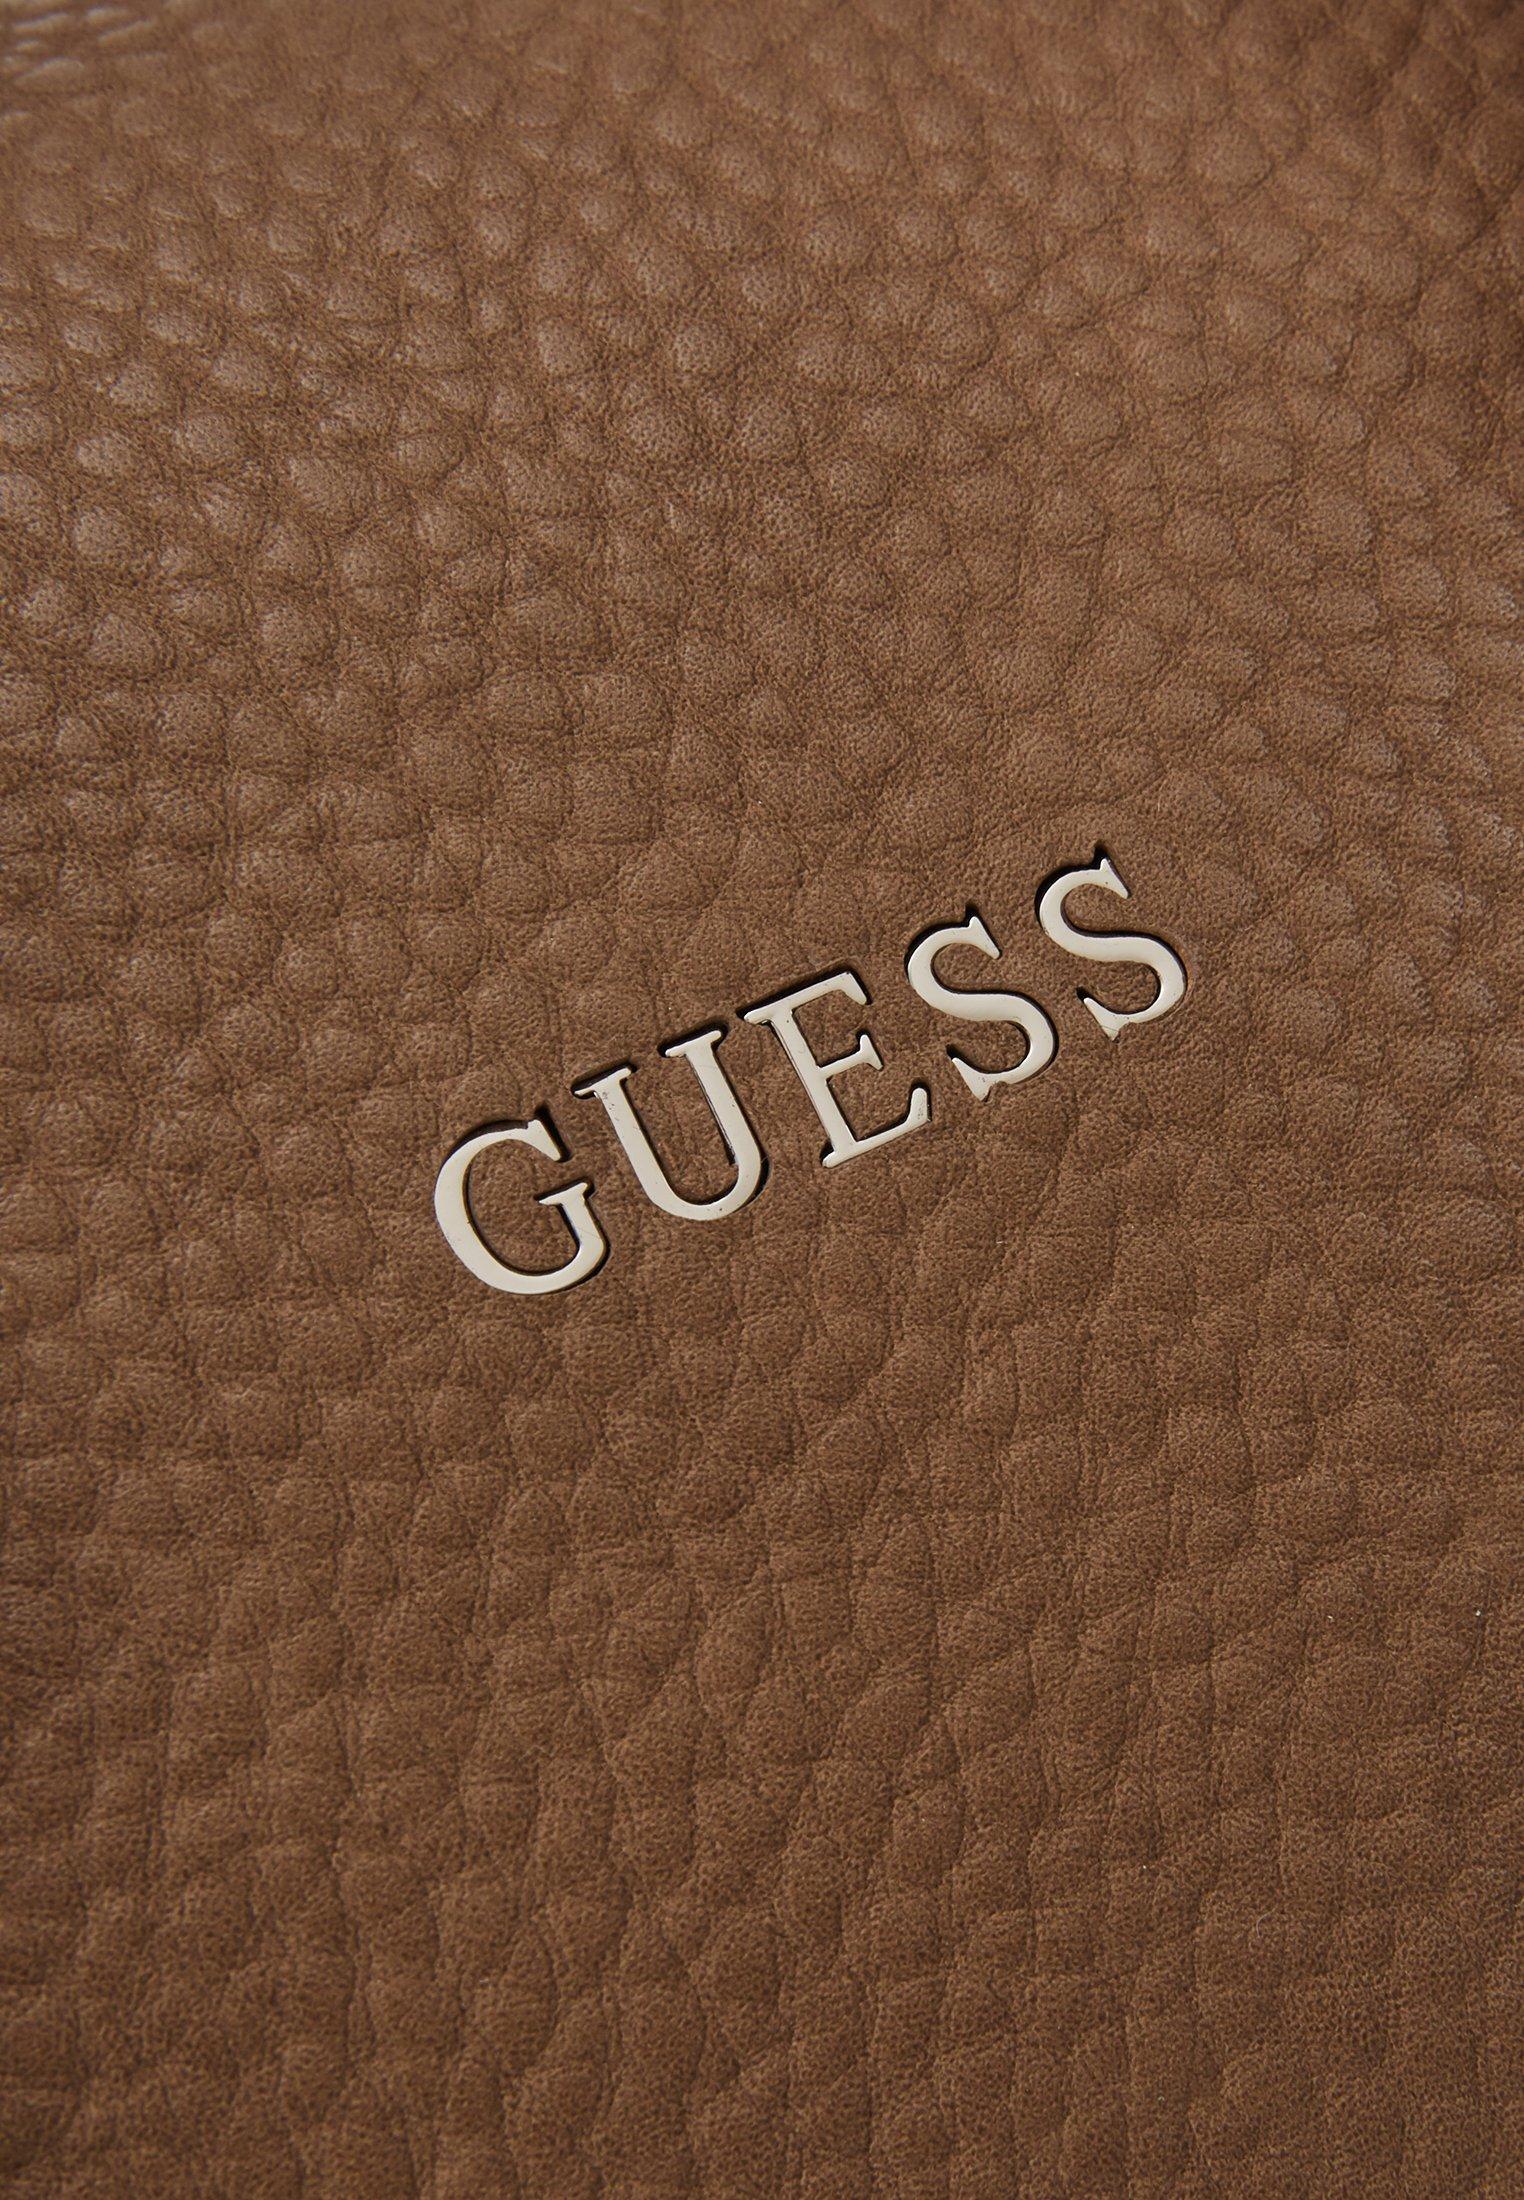 Guess Dan Briefcase - Mallette Mud